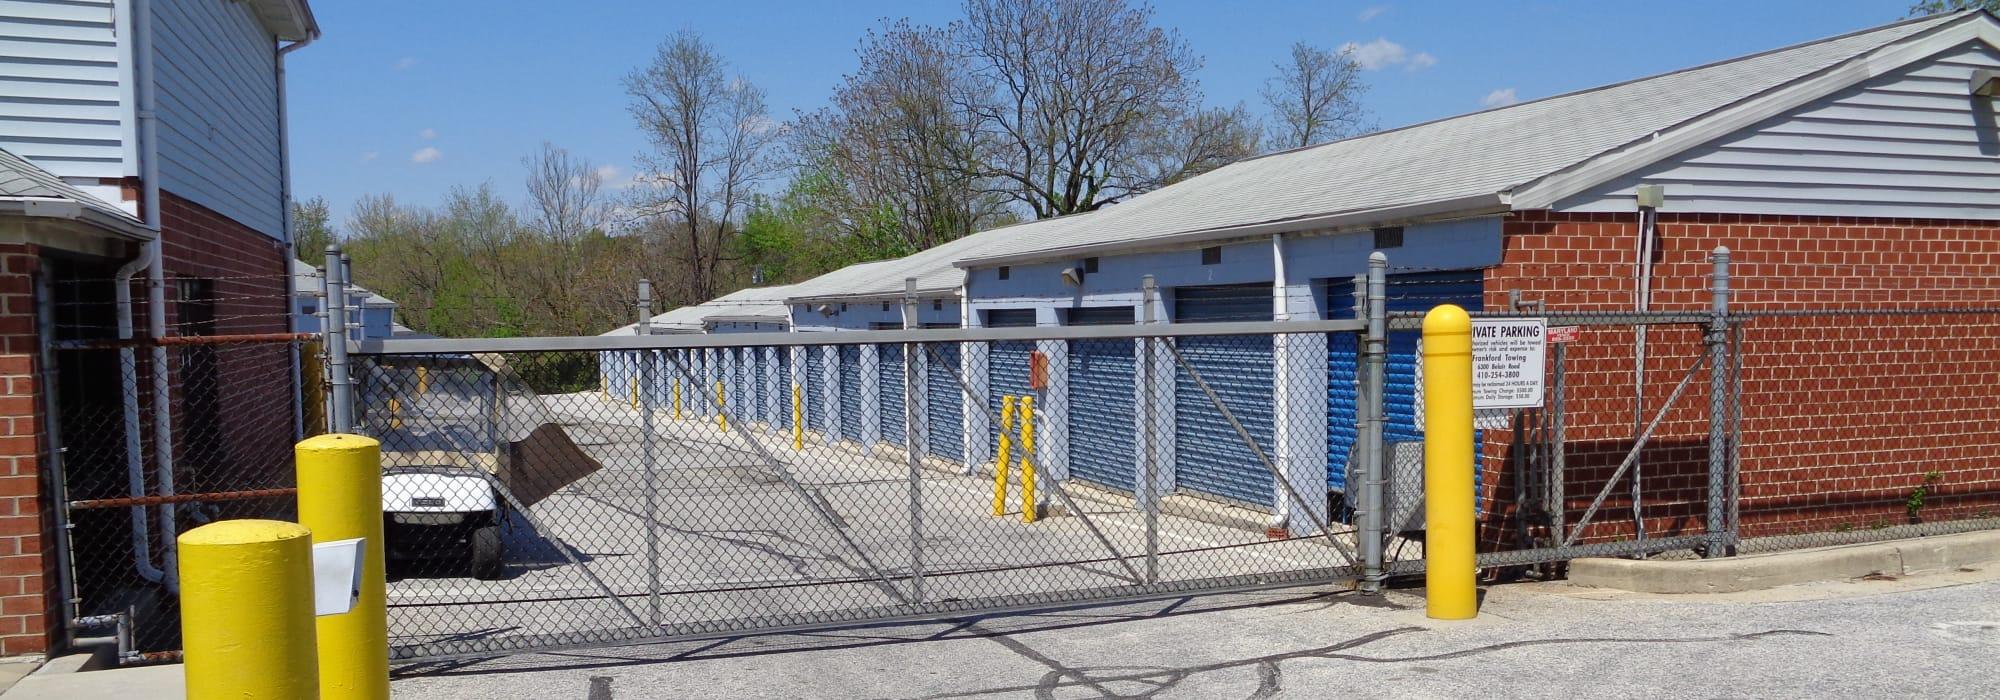 Prime Storage in Baltimore, MD